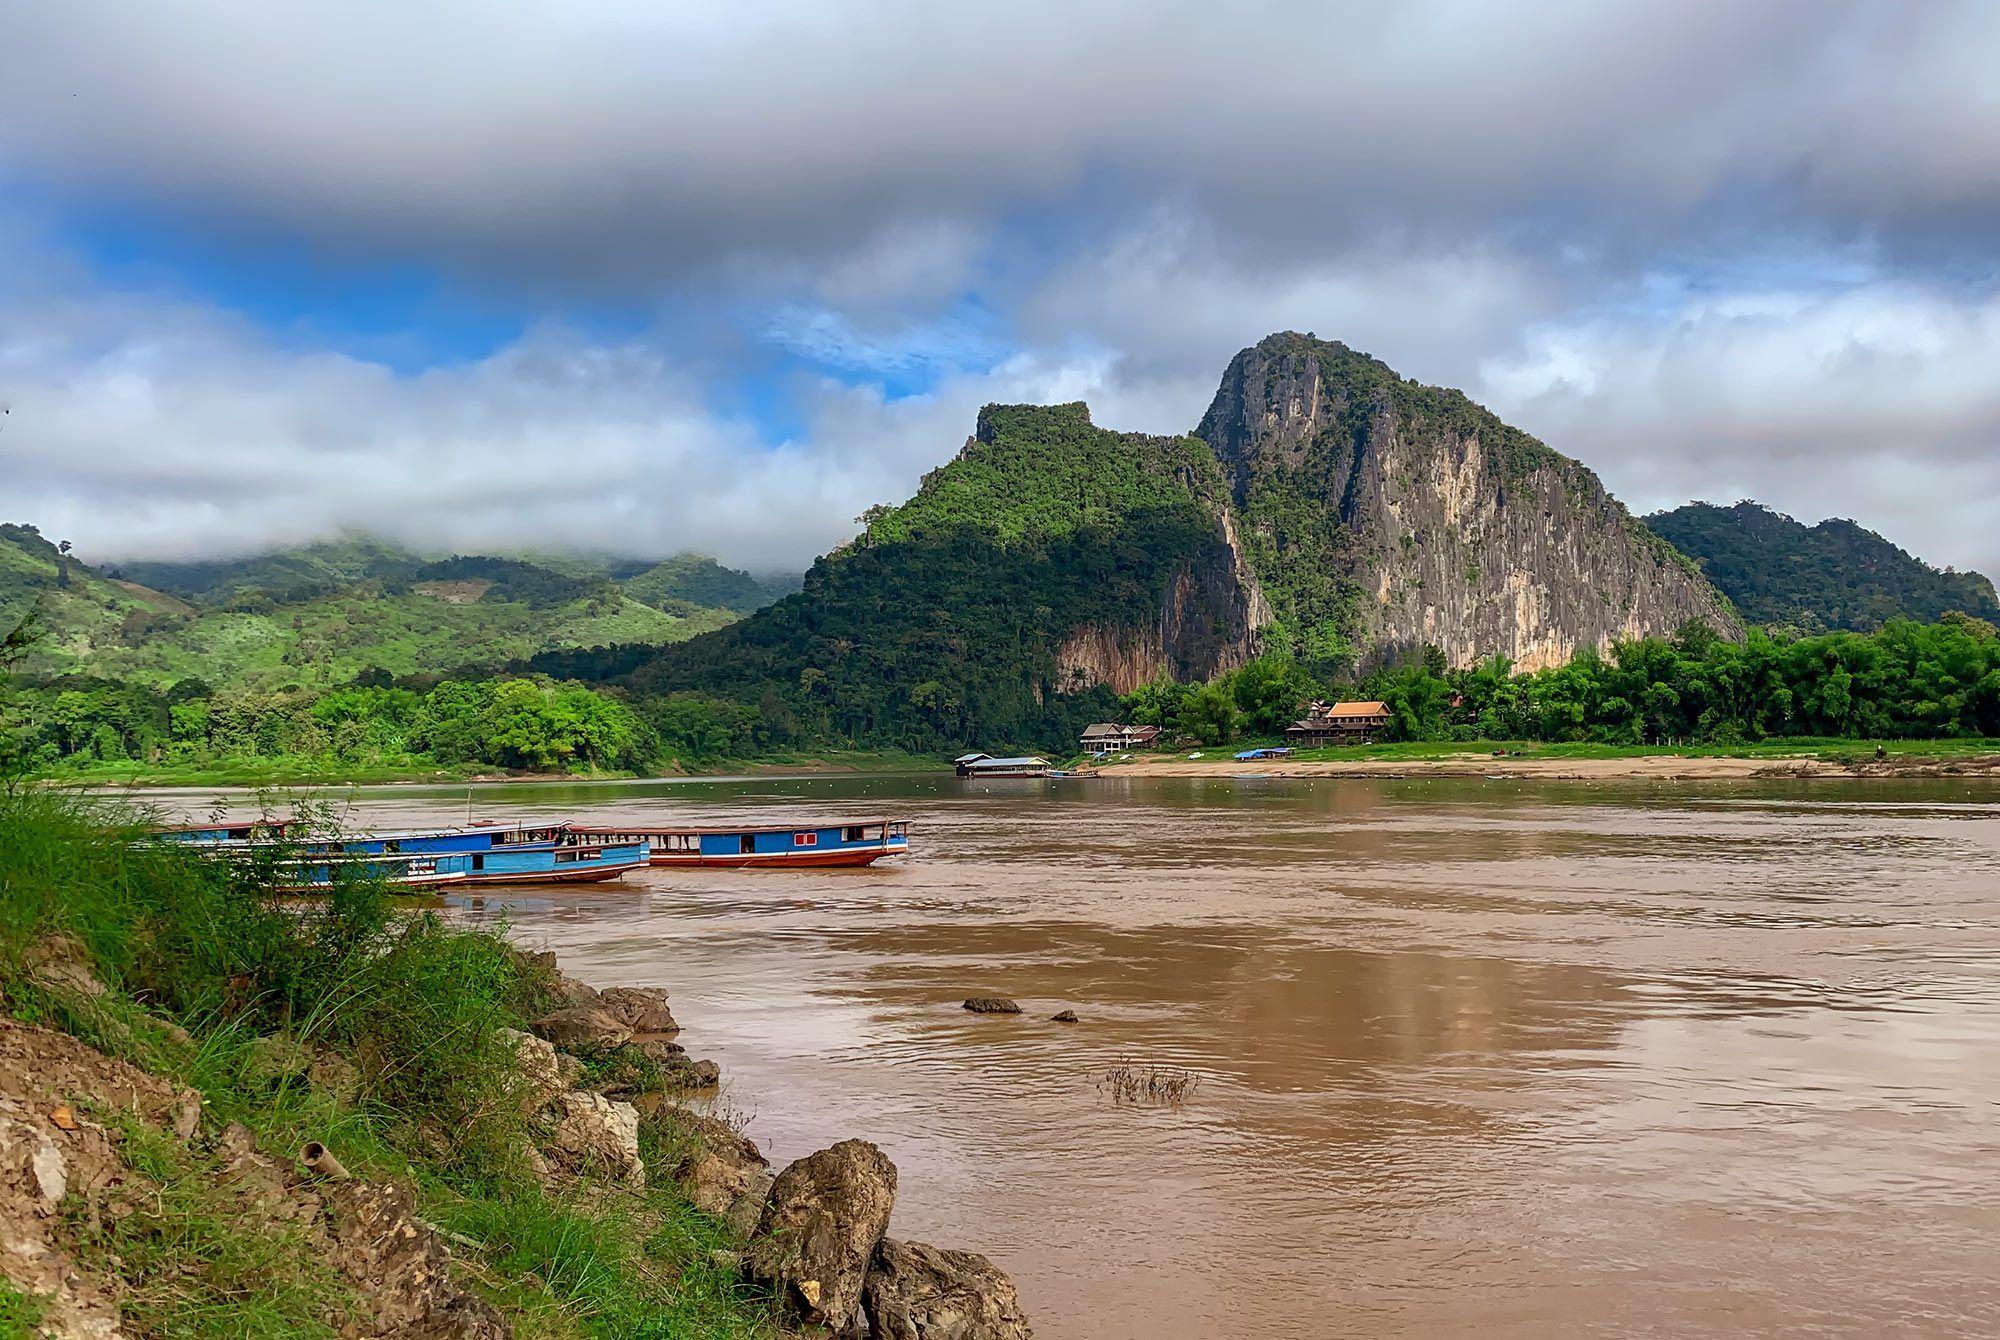 Mekong nördlich von Luang Prabang